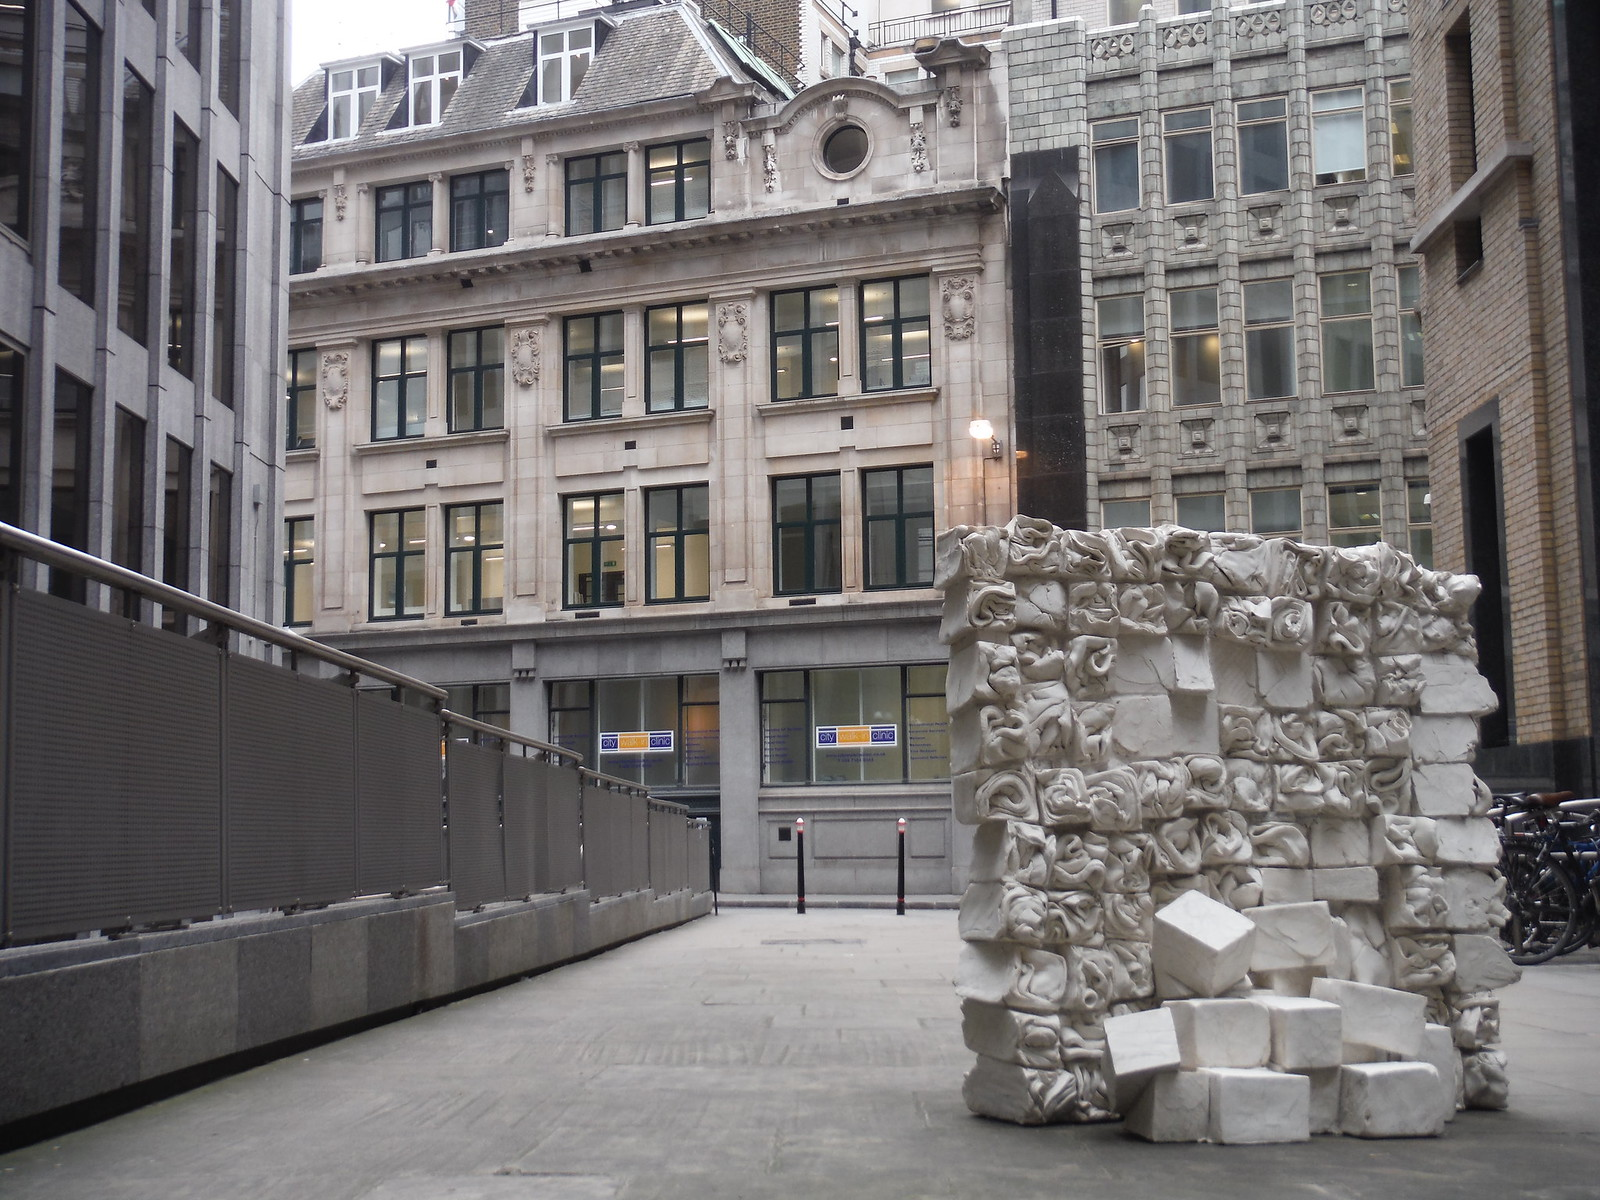 Fernando Casasempere - Reminiscence SWC Walk Short 24 - Sculpture in the City